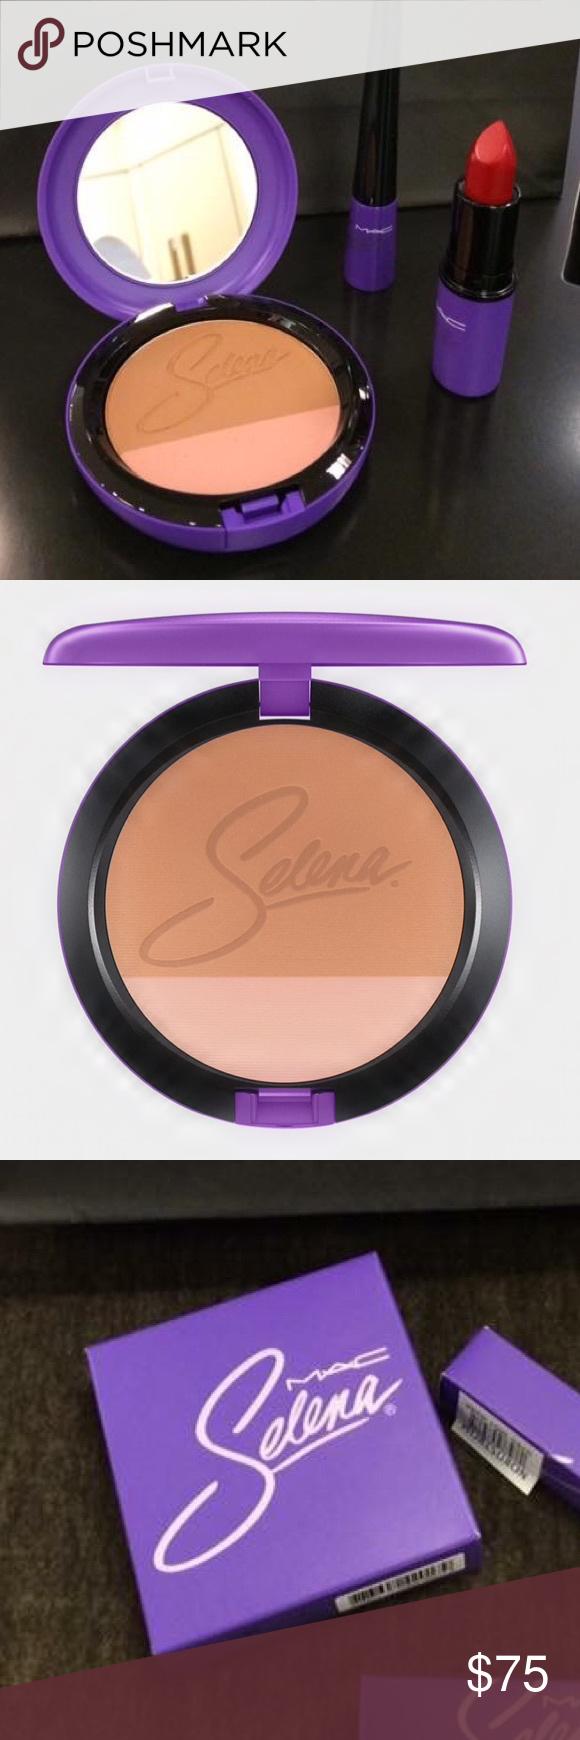 MAC Selena Powder Blush Duo Techno Cumbia NWT! NWT Mac